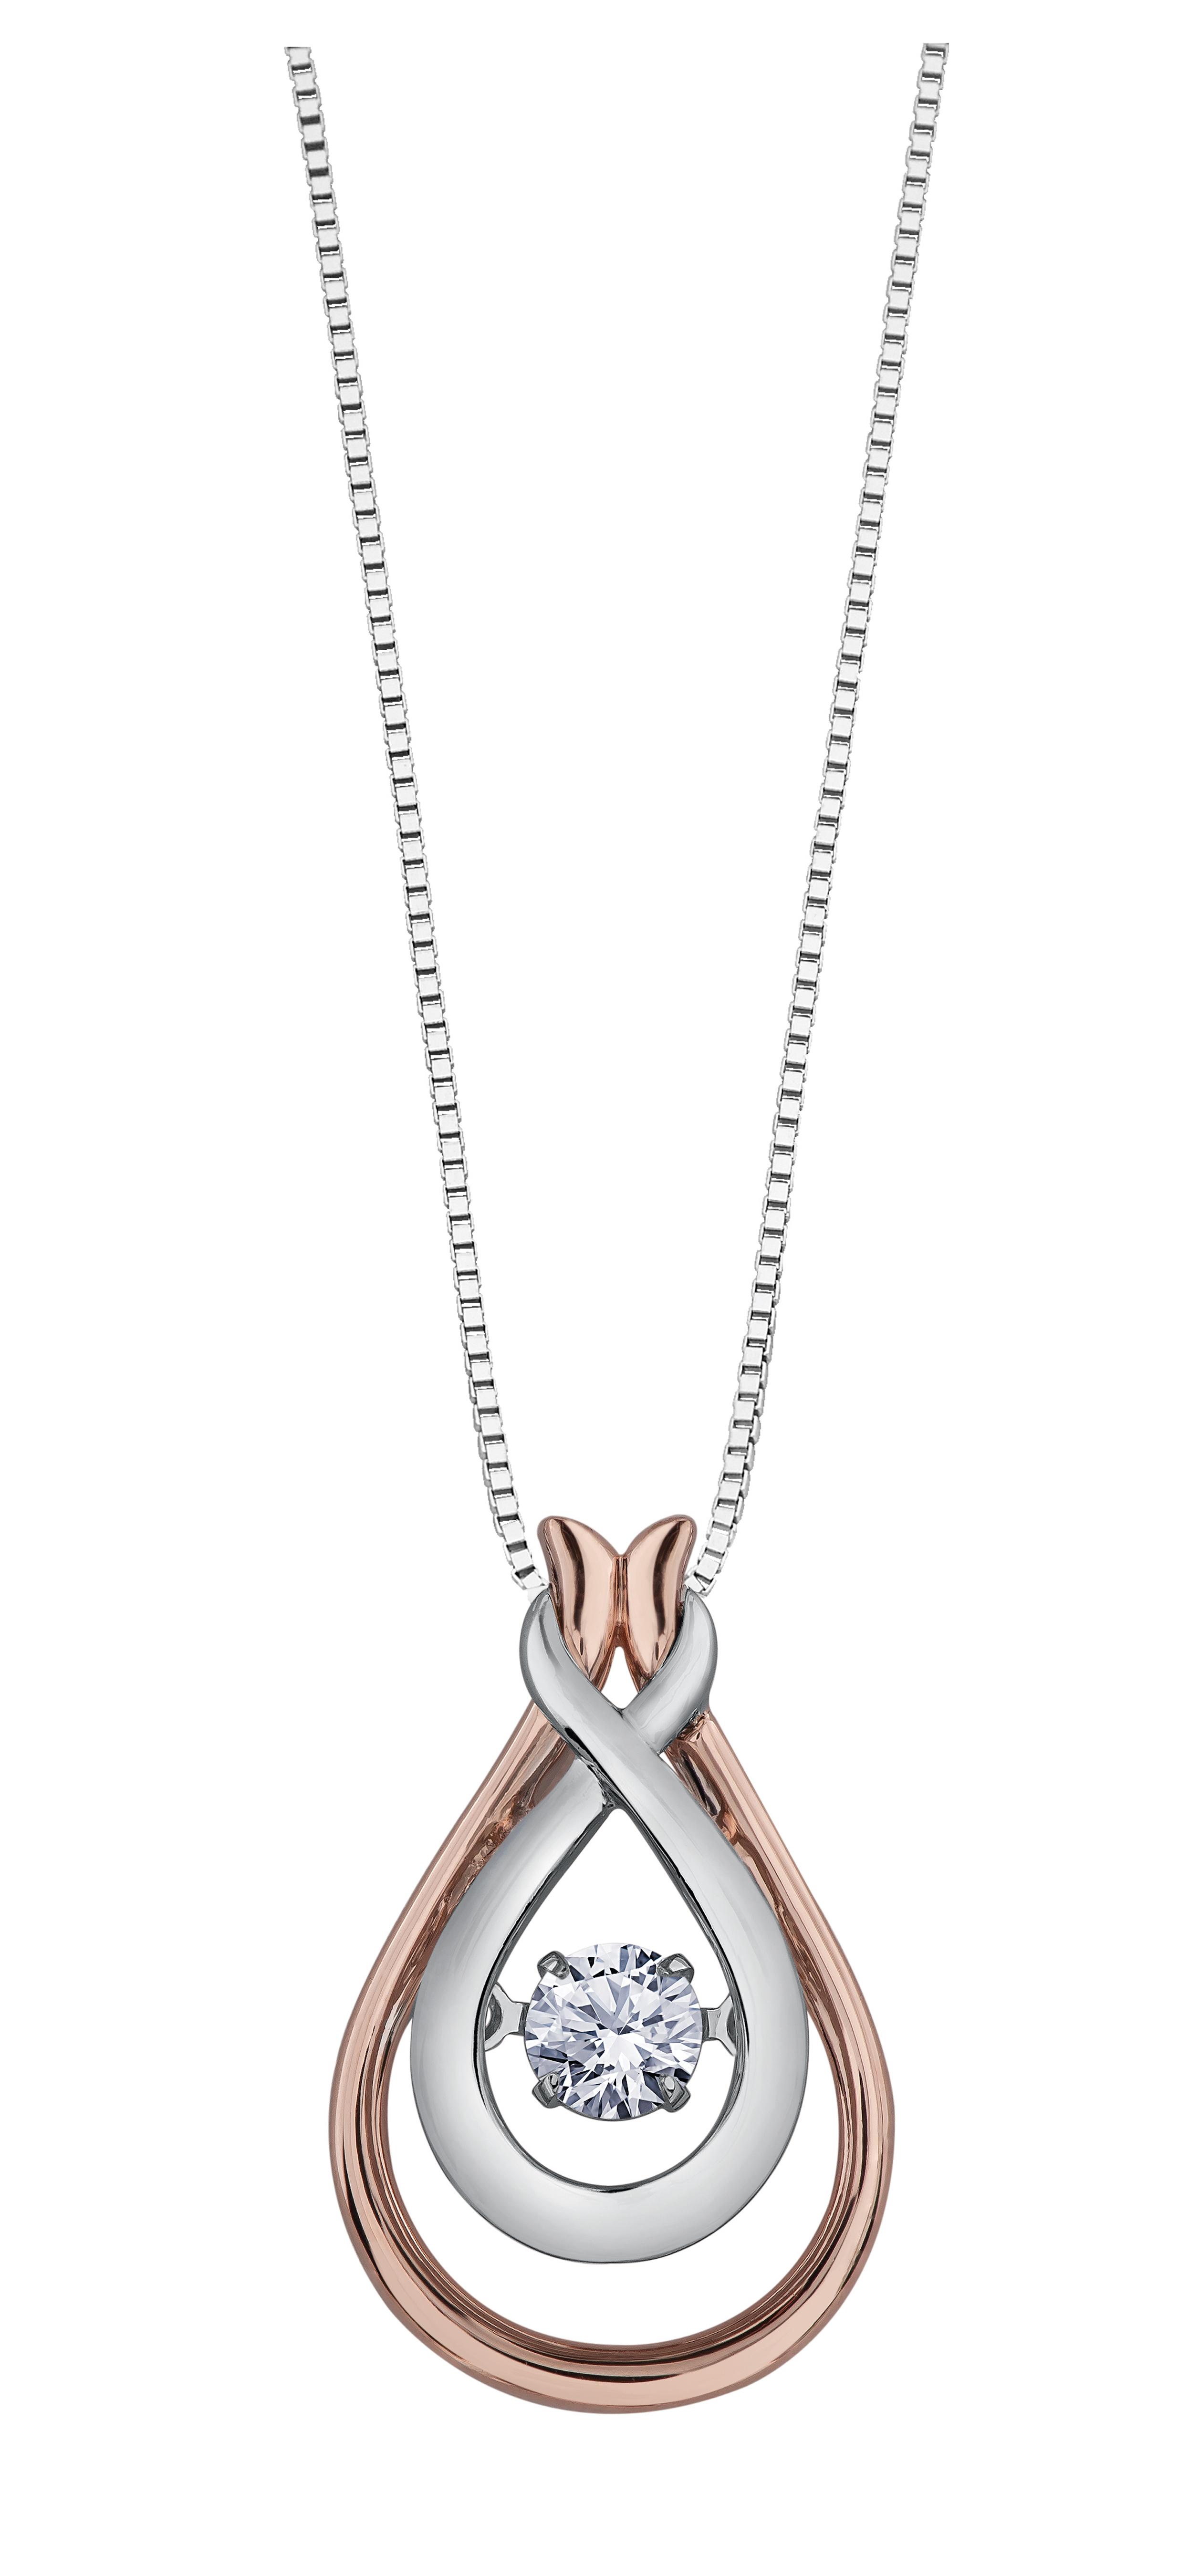 Pendentif - Or 2-tons 10K (rose et blanc) & Diamant Canadien totalisant 0.17 Carat